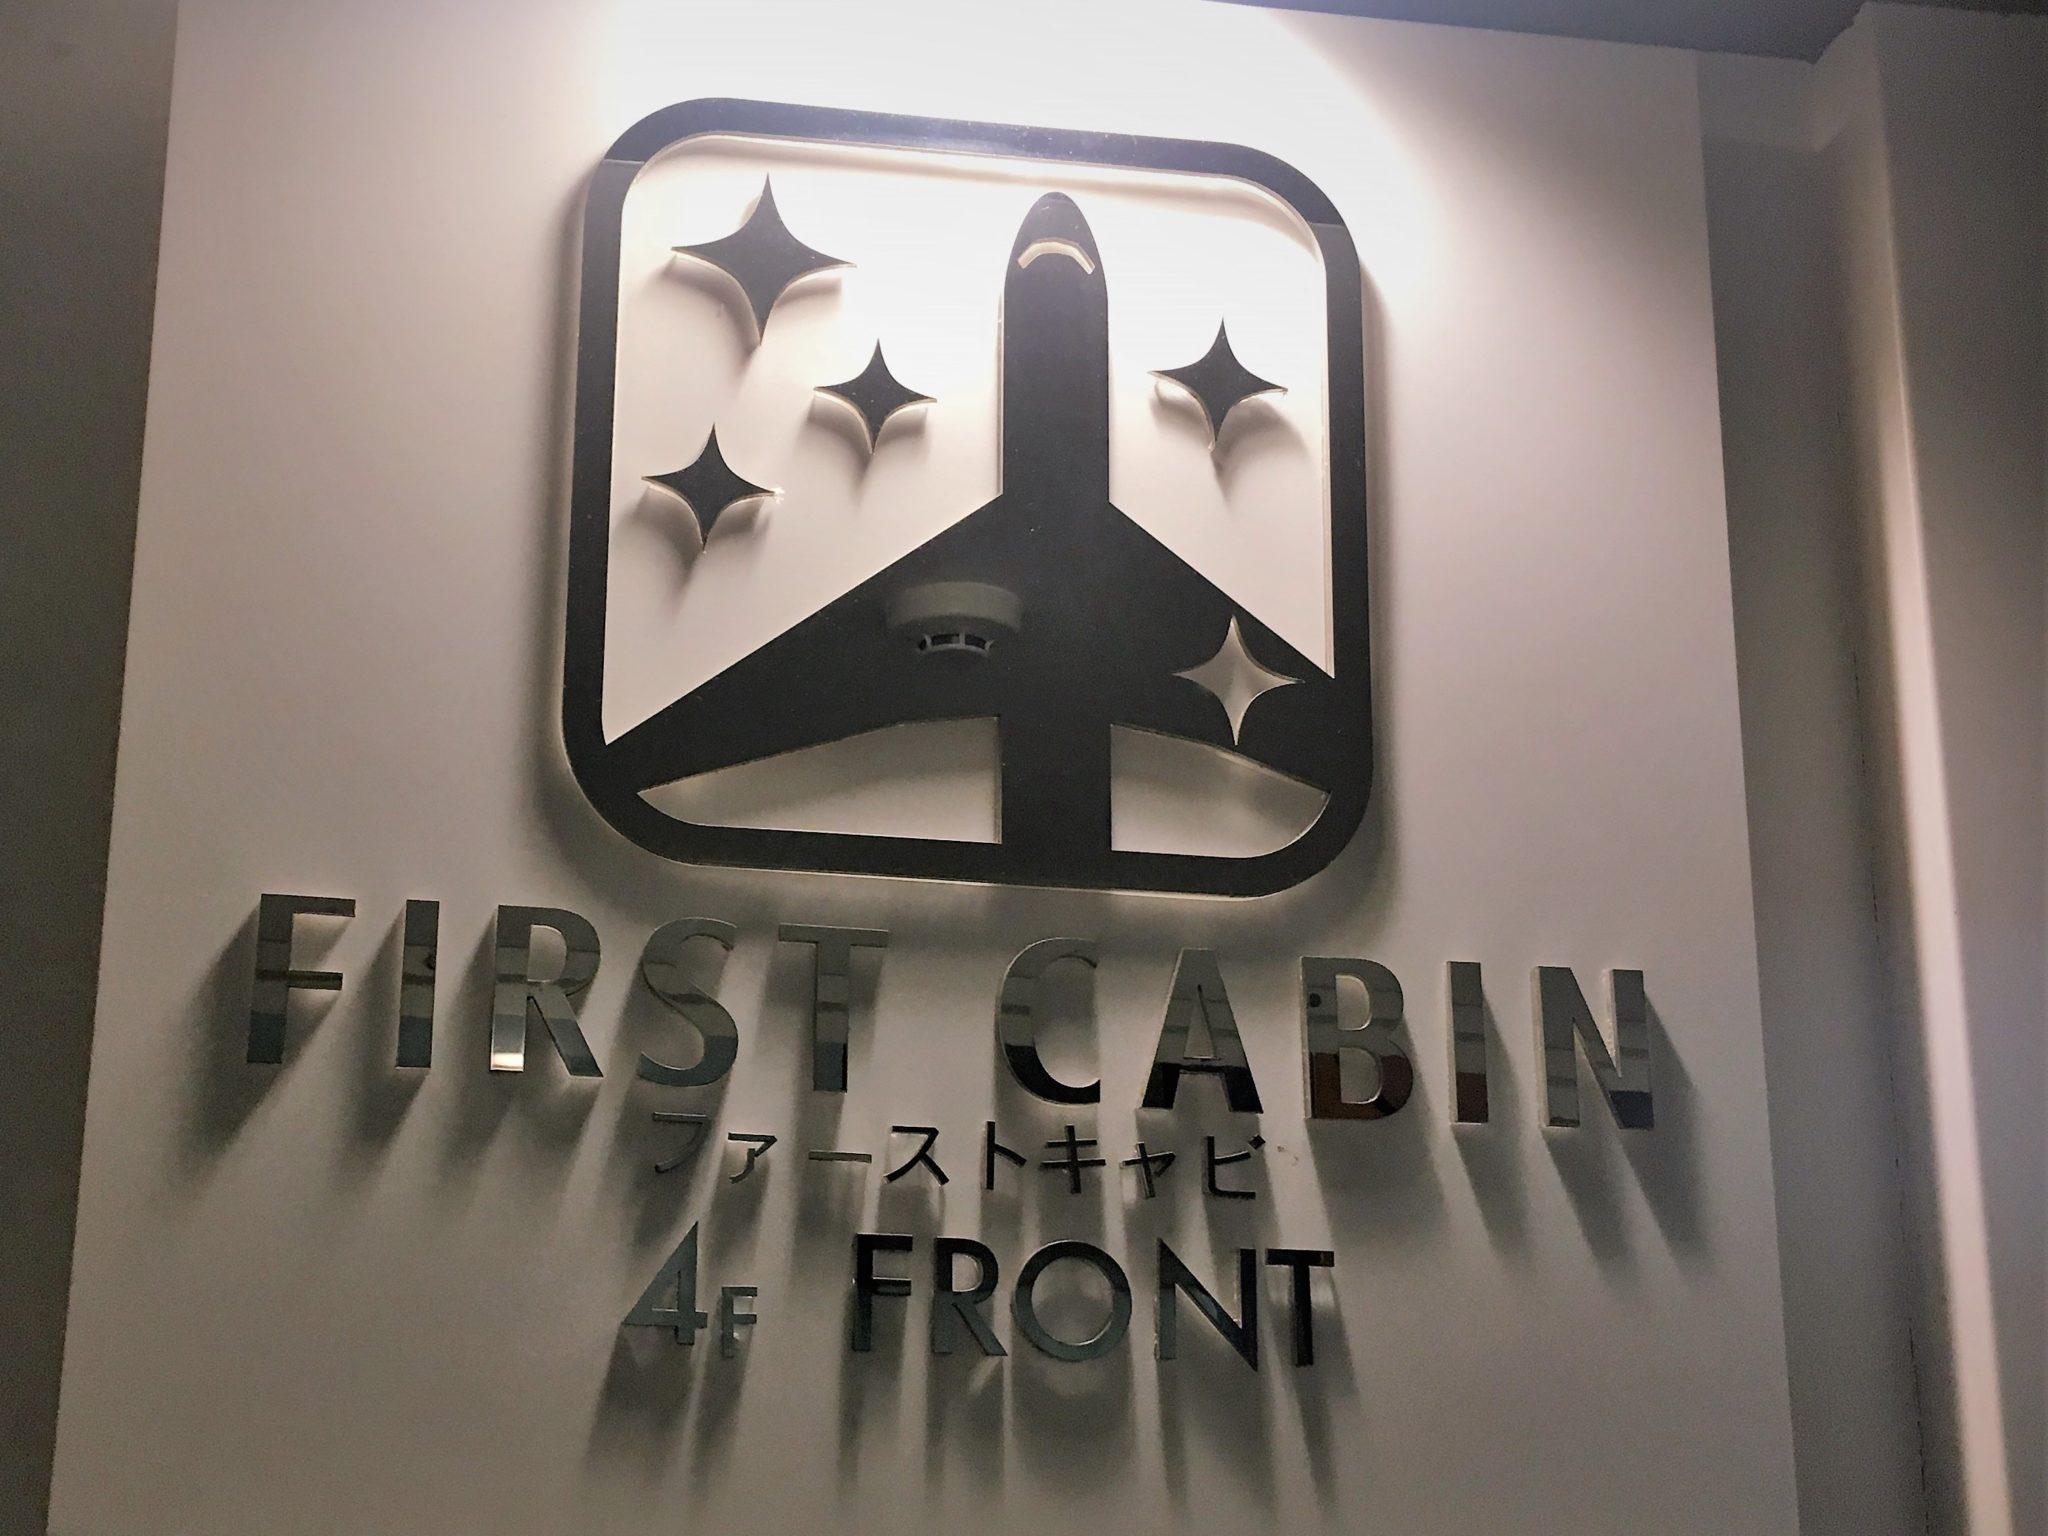 Capsule hotel First Cabin in Japan